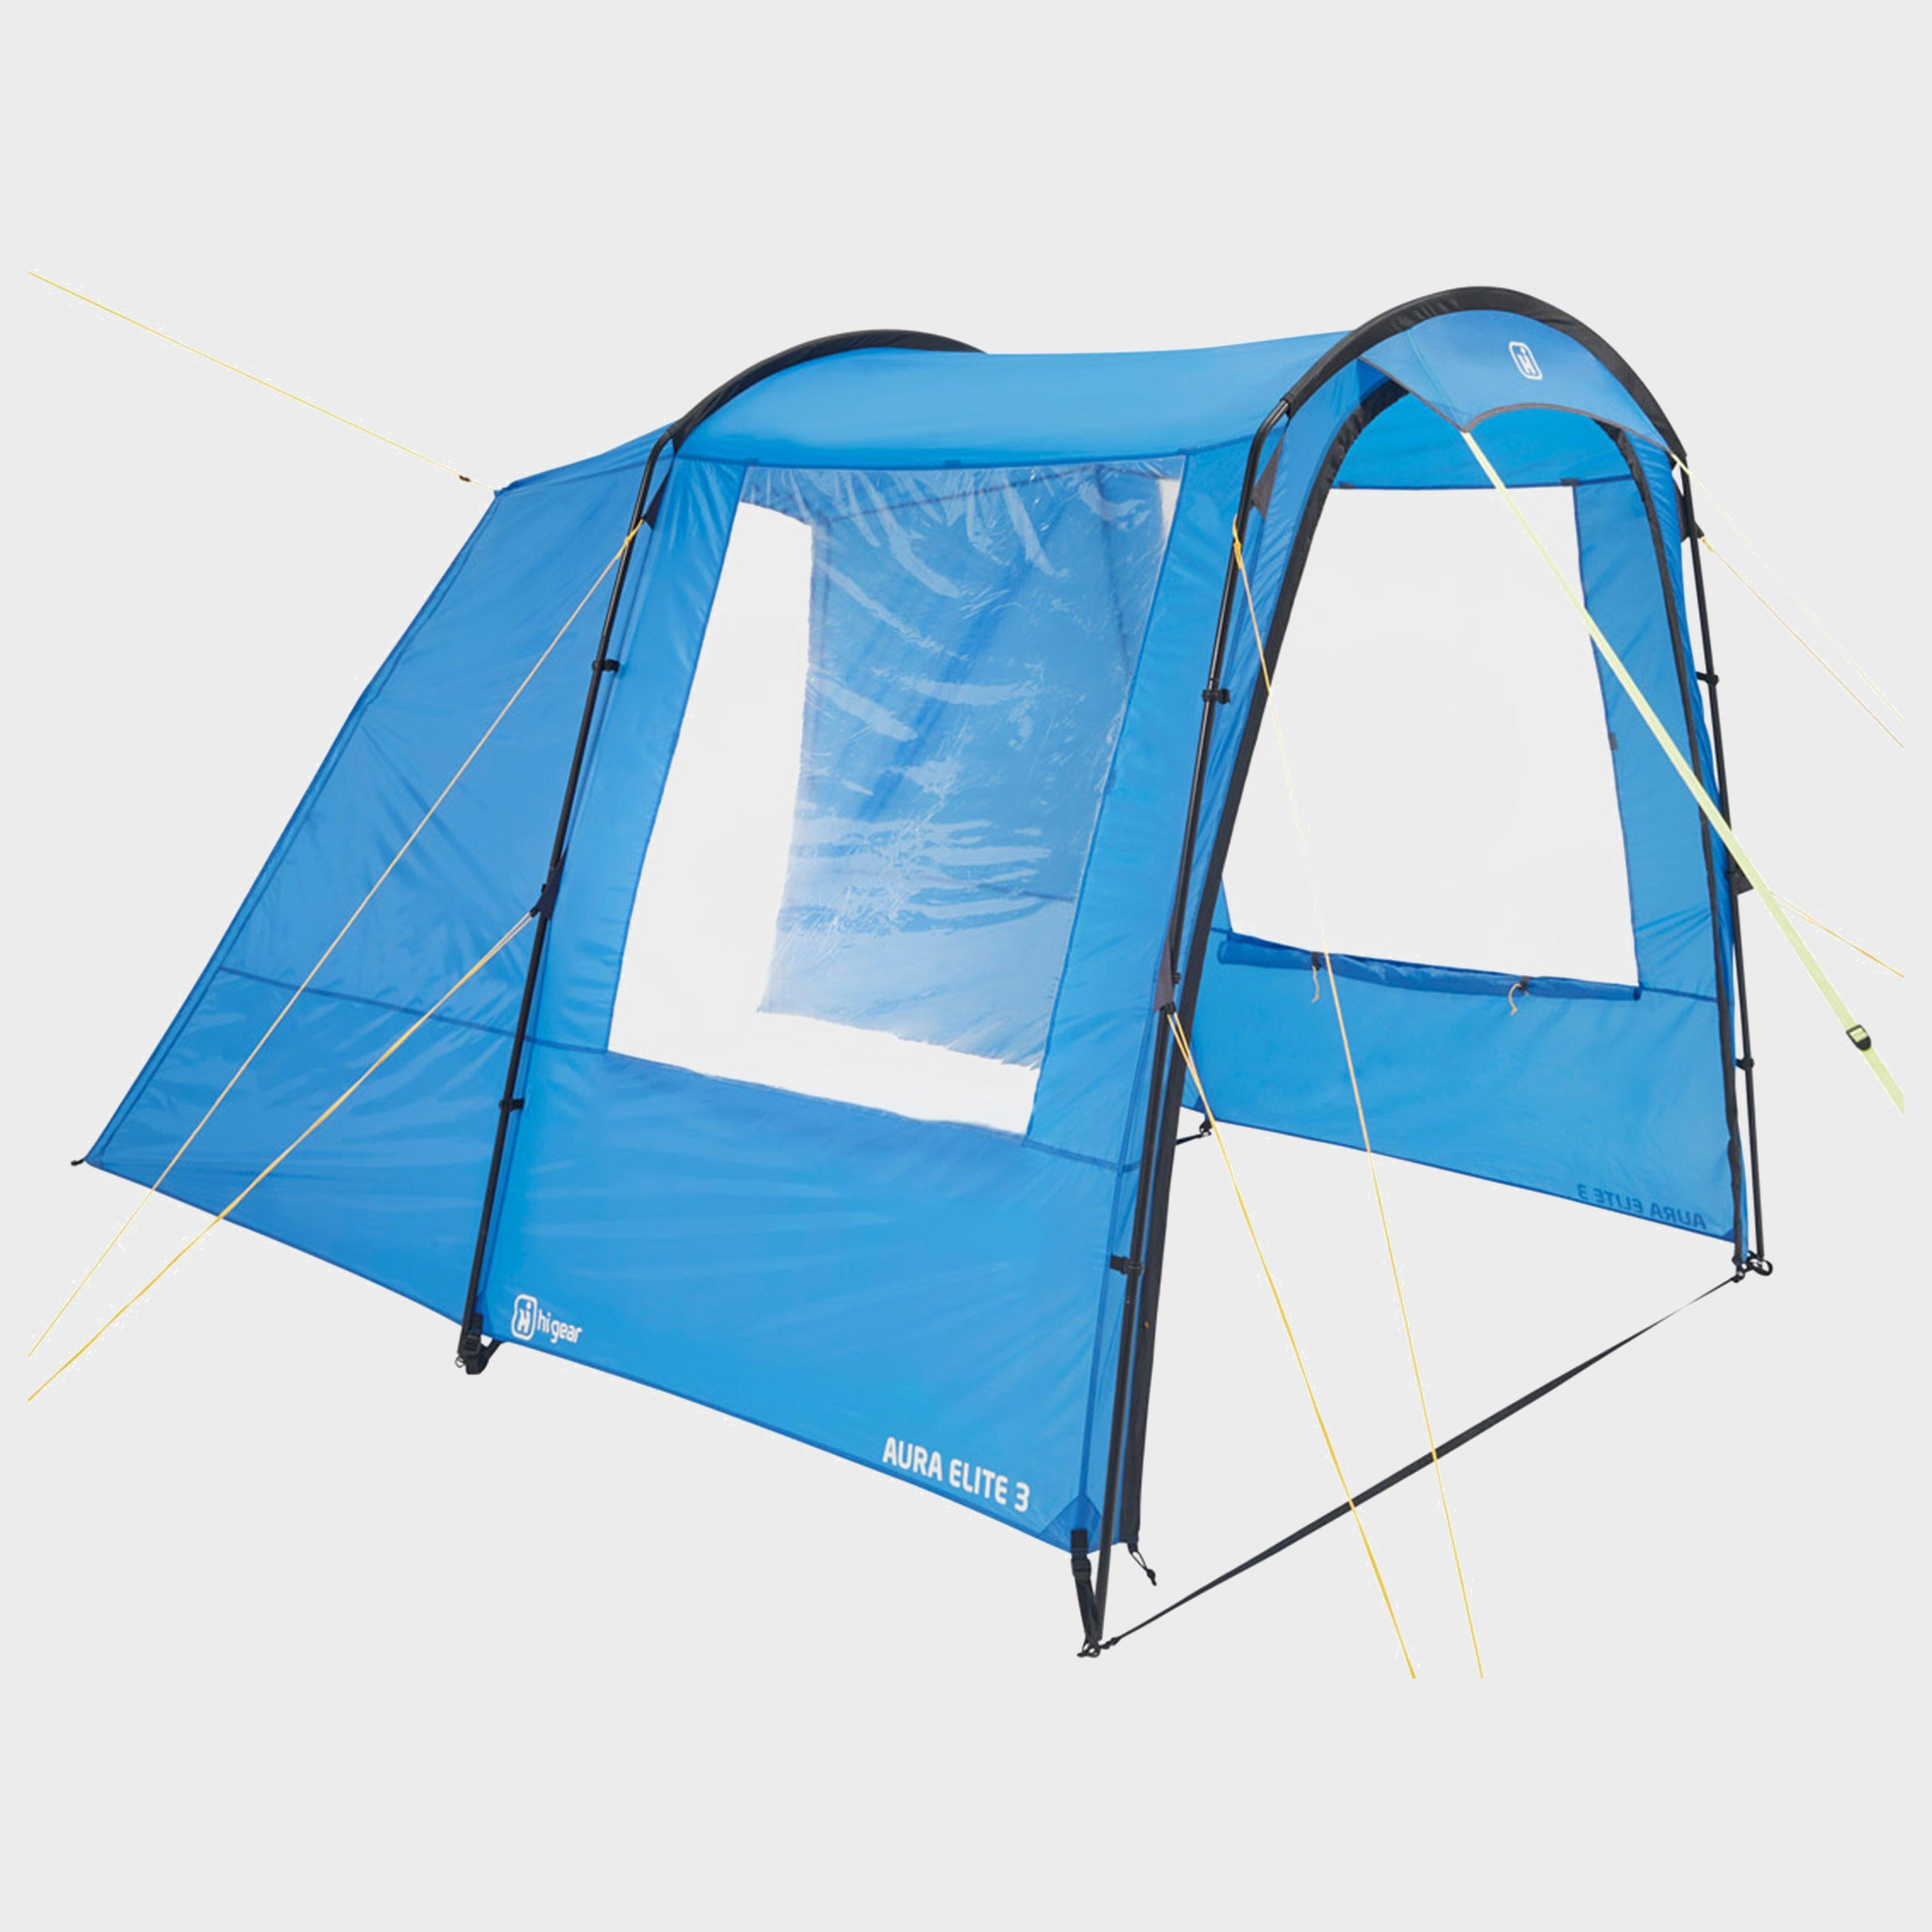 Hi-gear Aura 3 - Blue/porch  Blue/porch